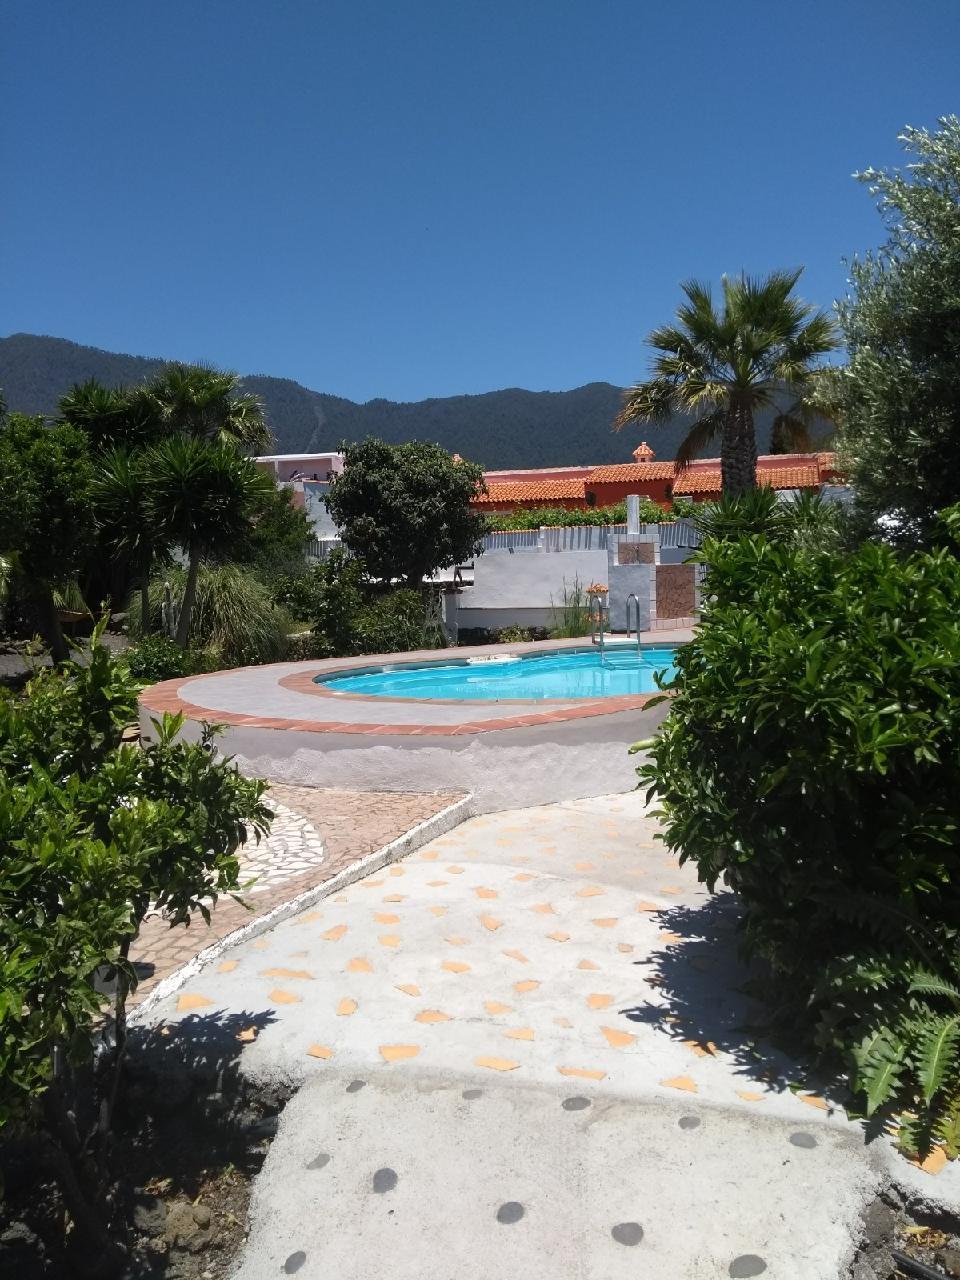 Ferienhaus Finca Primavera (144700), El Paso, La Palma, Kanarische Inseln, Spanien, Bild 28